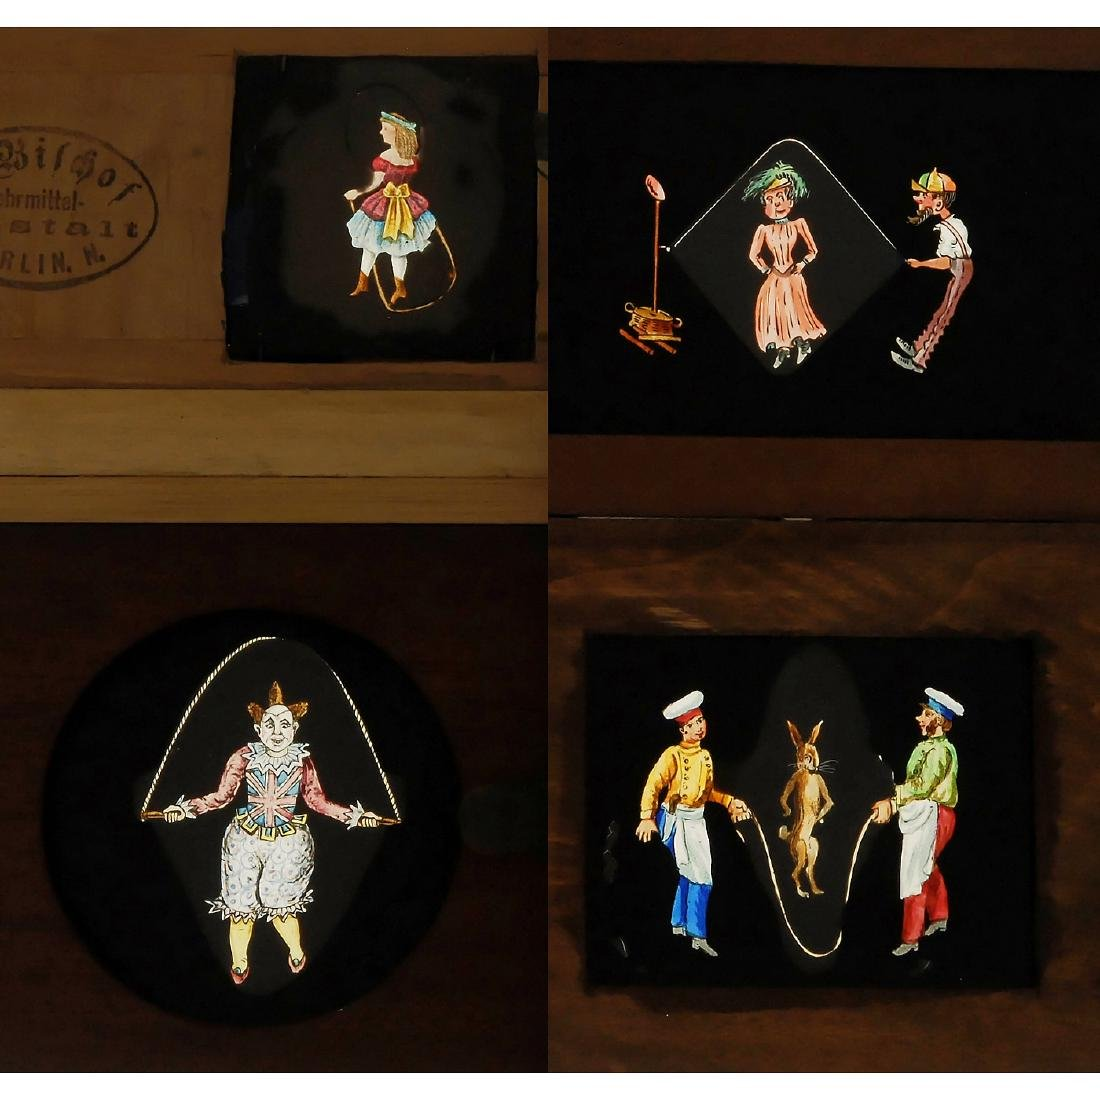 4 Magic Lantern Skipping Slides, c. 1870-80 - 2